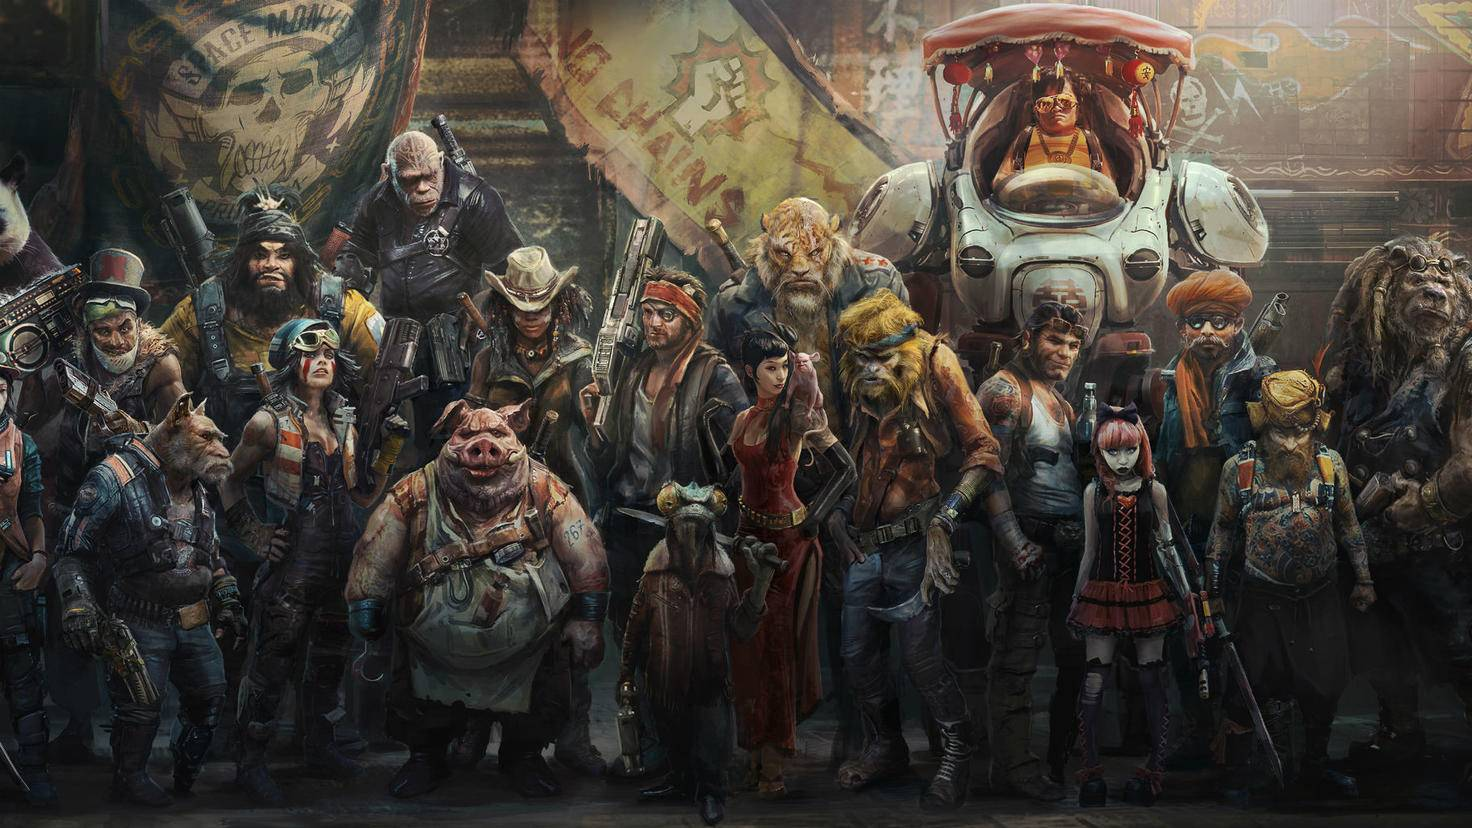 beyond-good-and-evil-2-concept-art-pirates